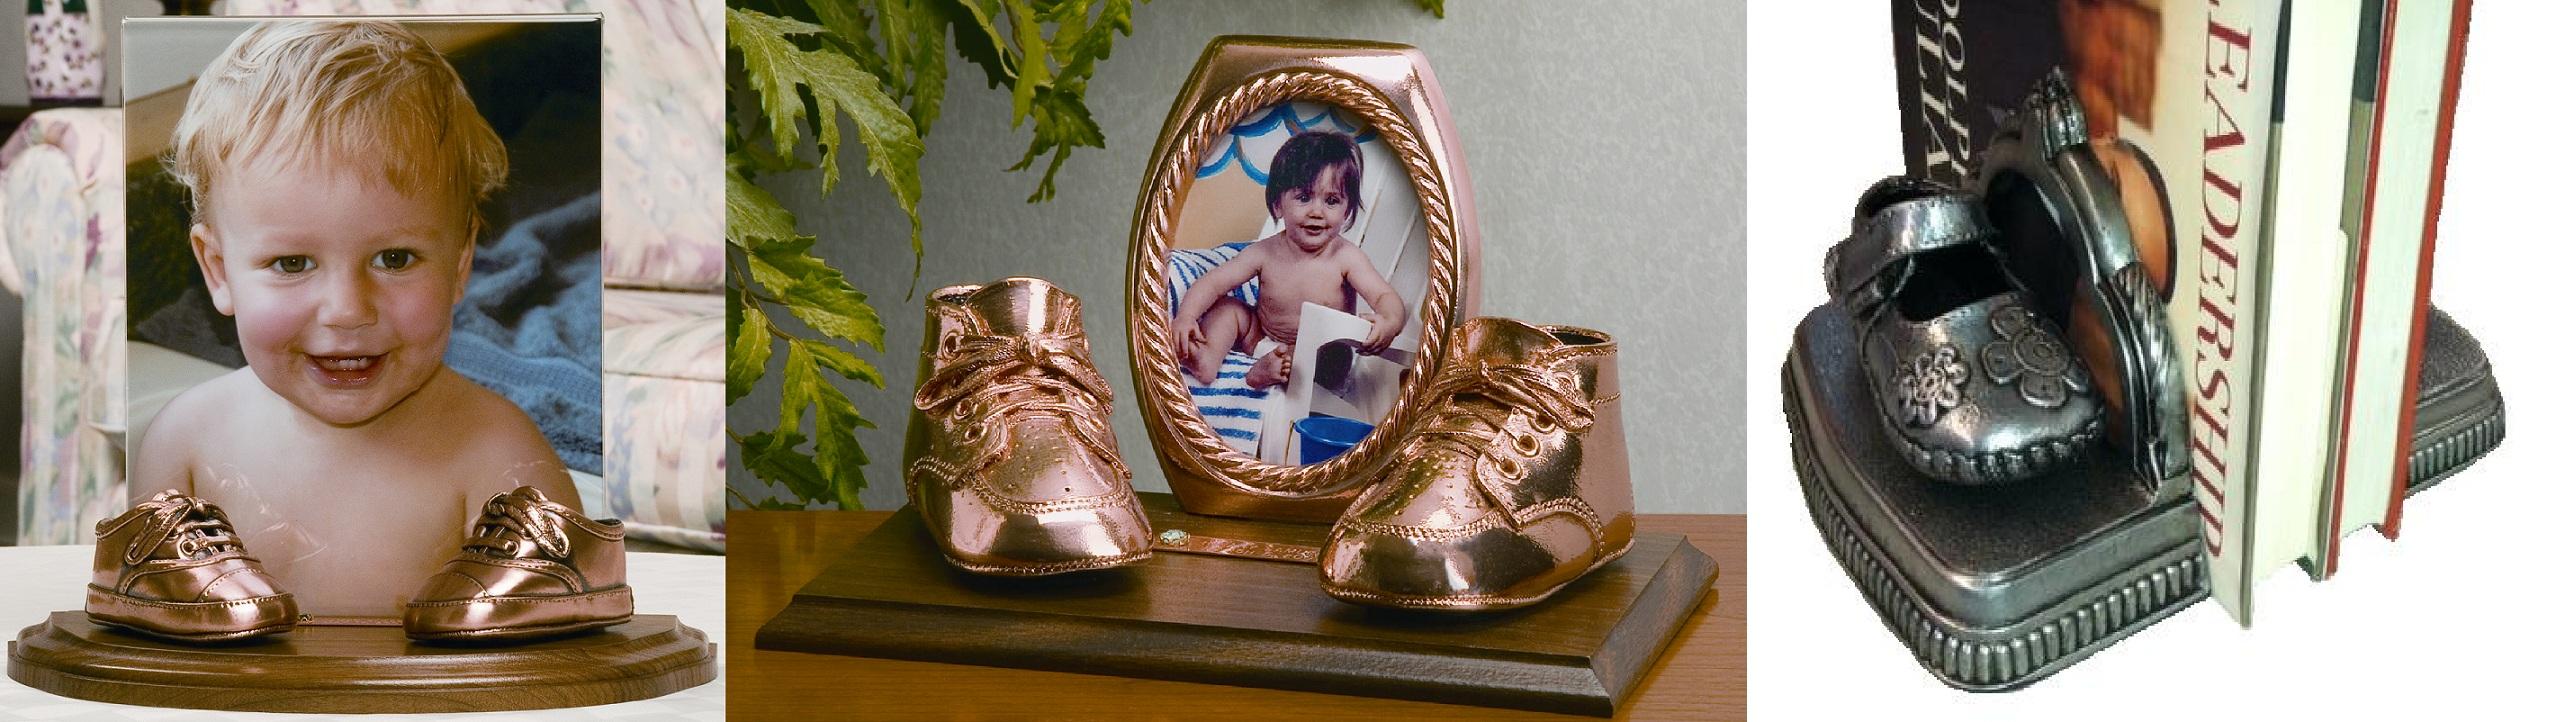 Baby Shoe Bronzing - Baby Shoe Bronzing Keepsakes